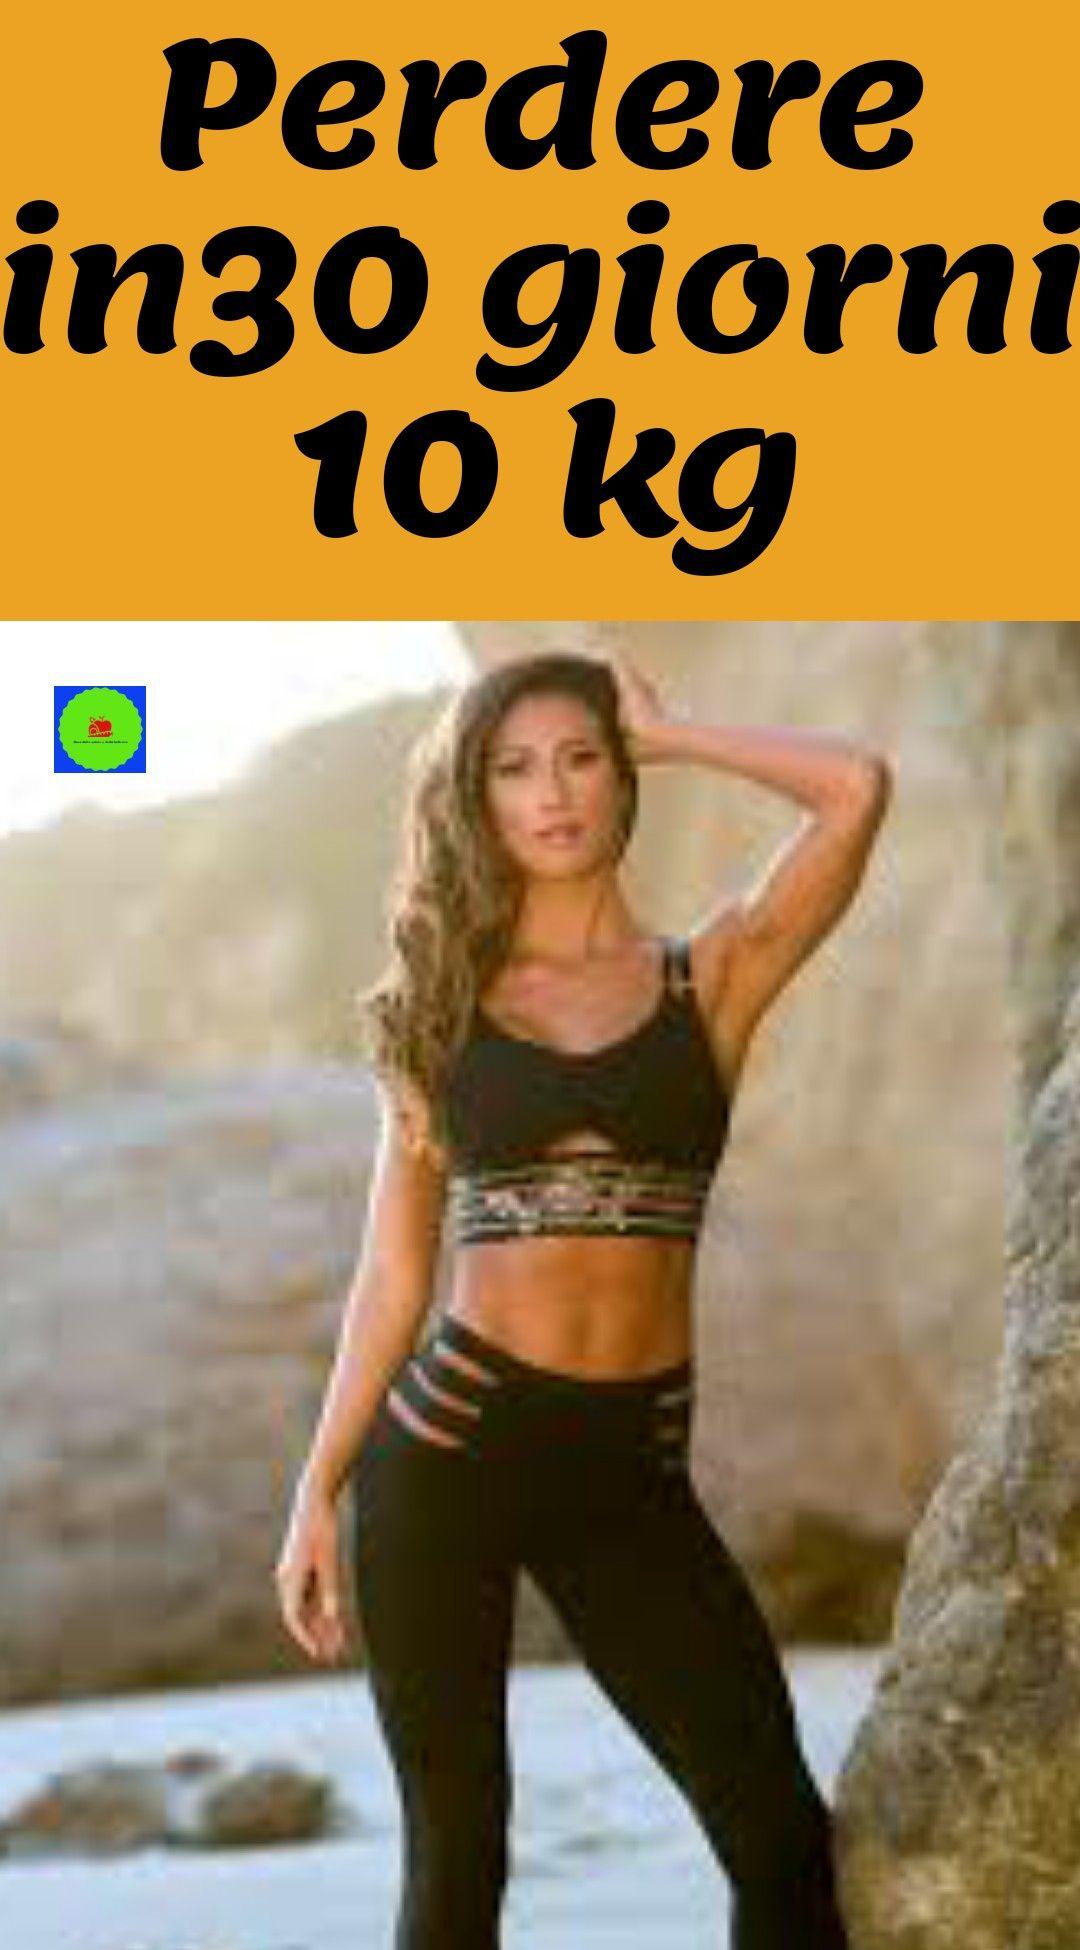 Photo of Perdere in30 giorni 10 kg